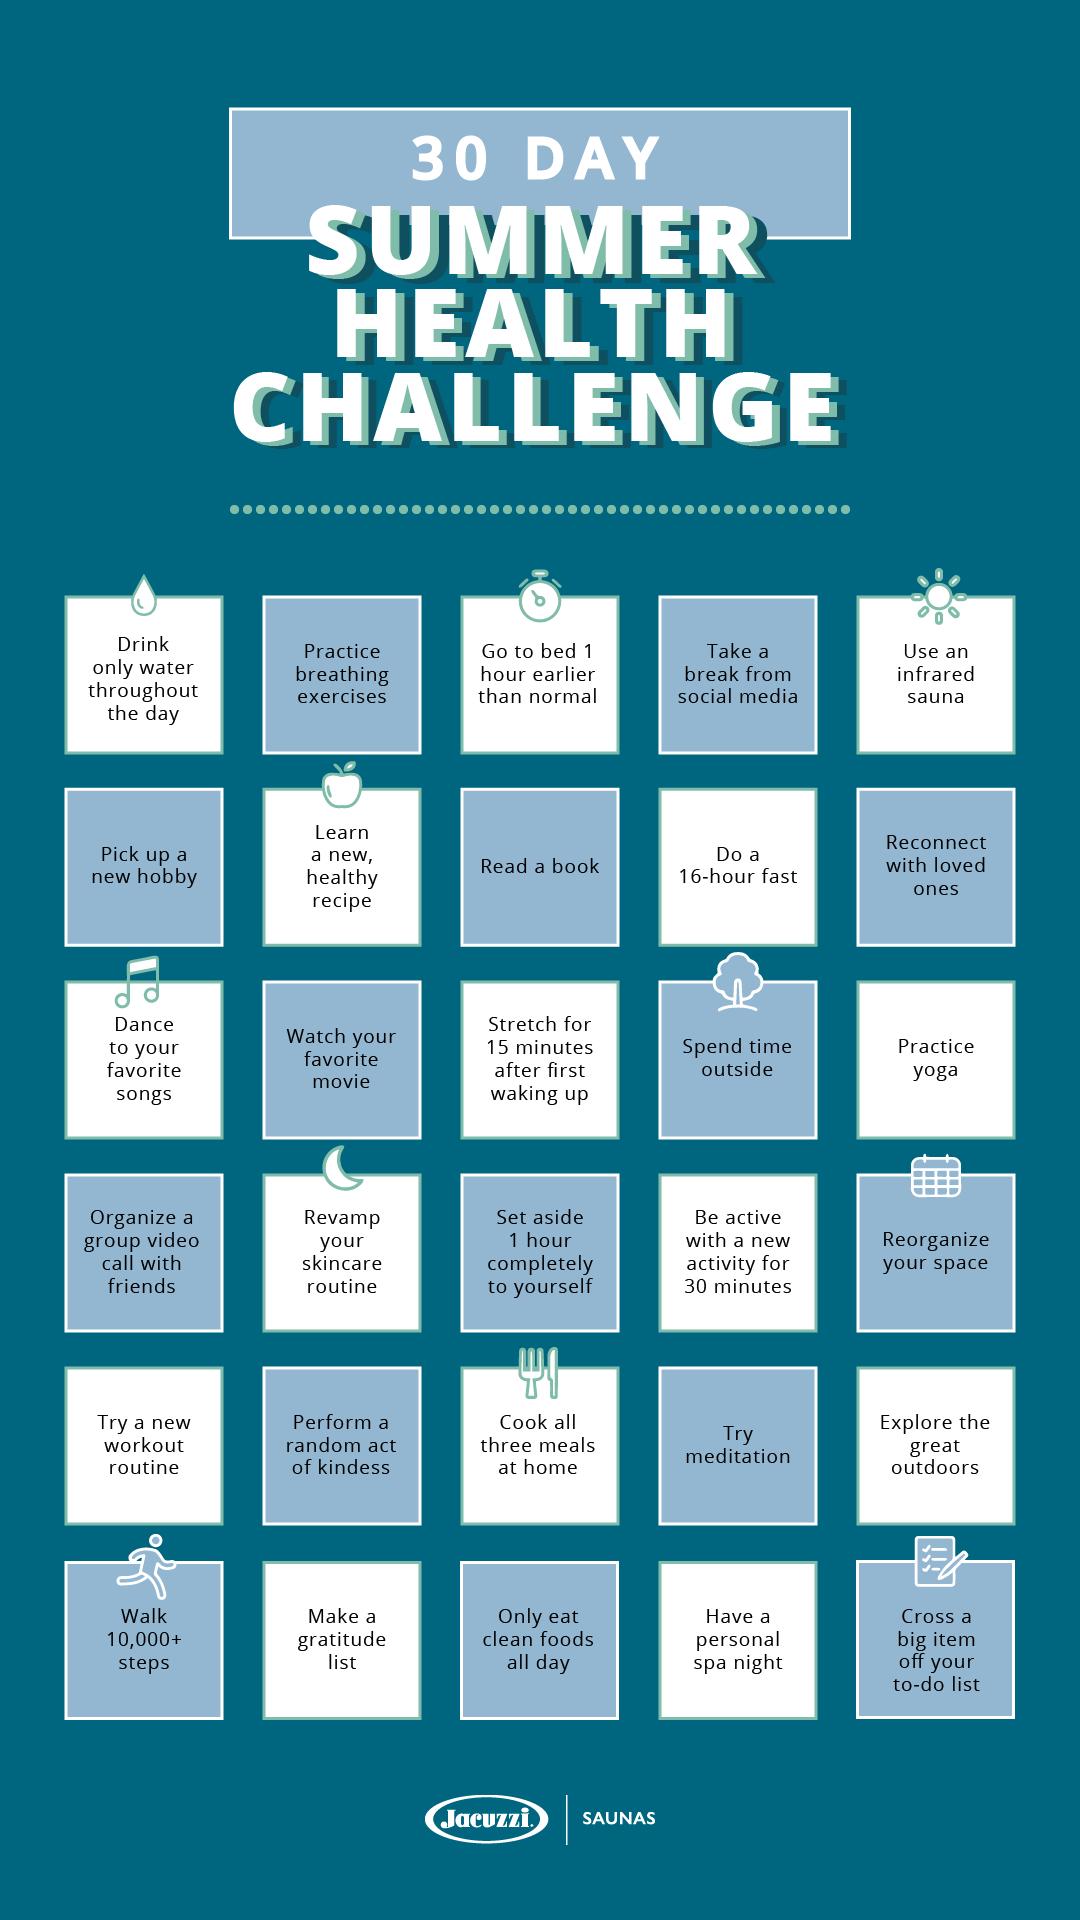 30-Day-Summer-Health-Challenge-by-Clearlight-Infrared-Saunas